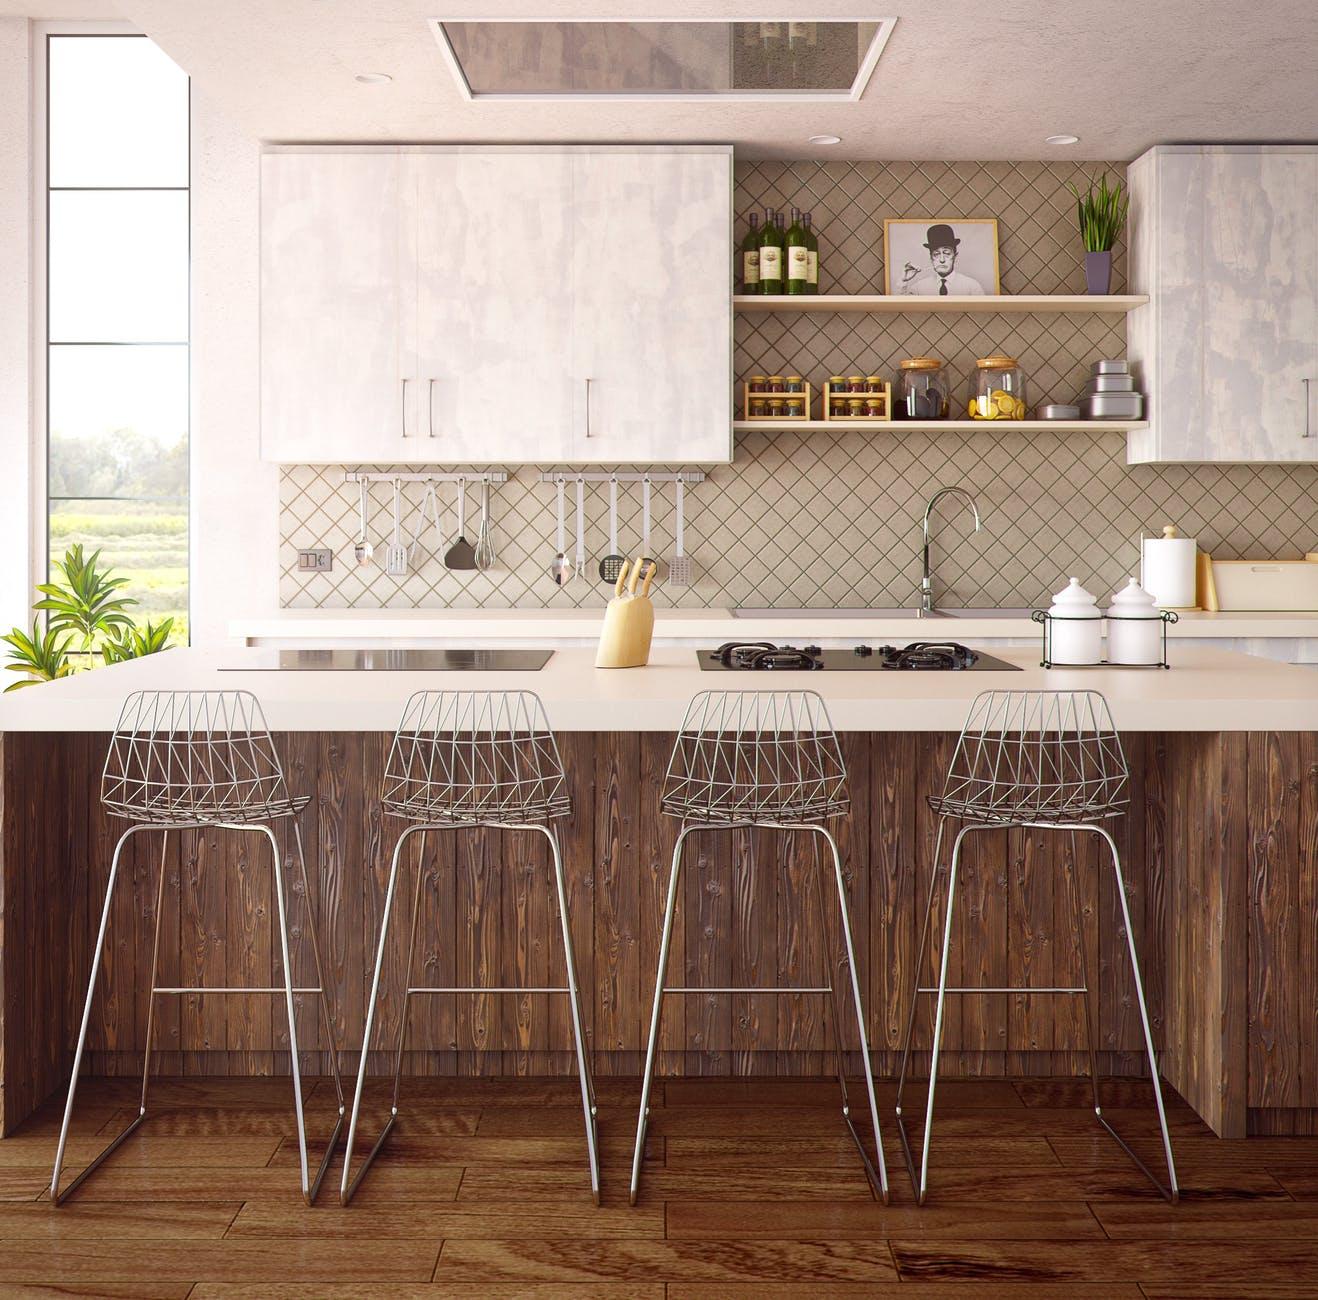 Keuken pimpen